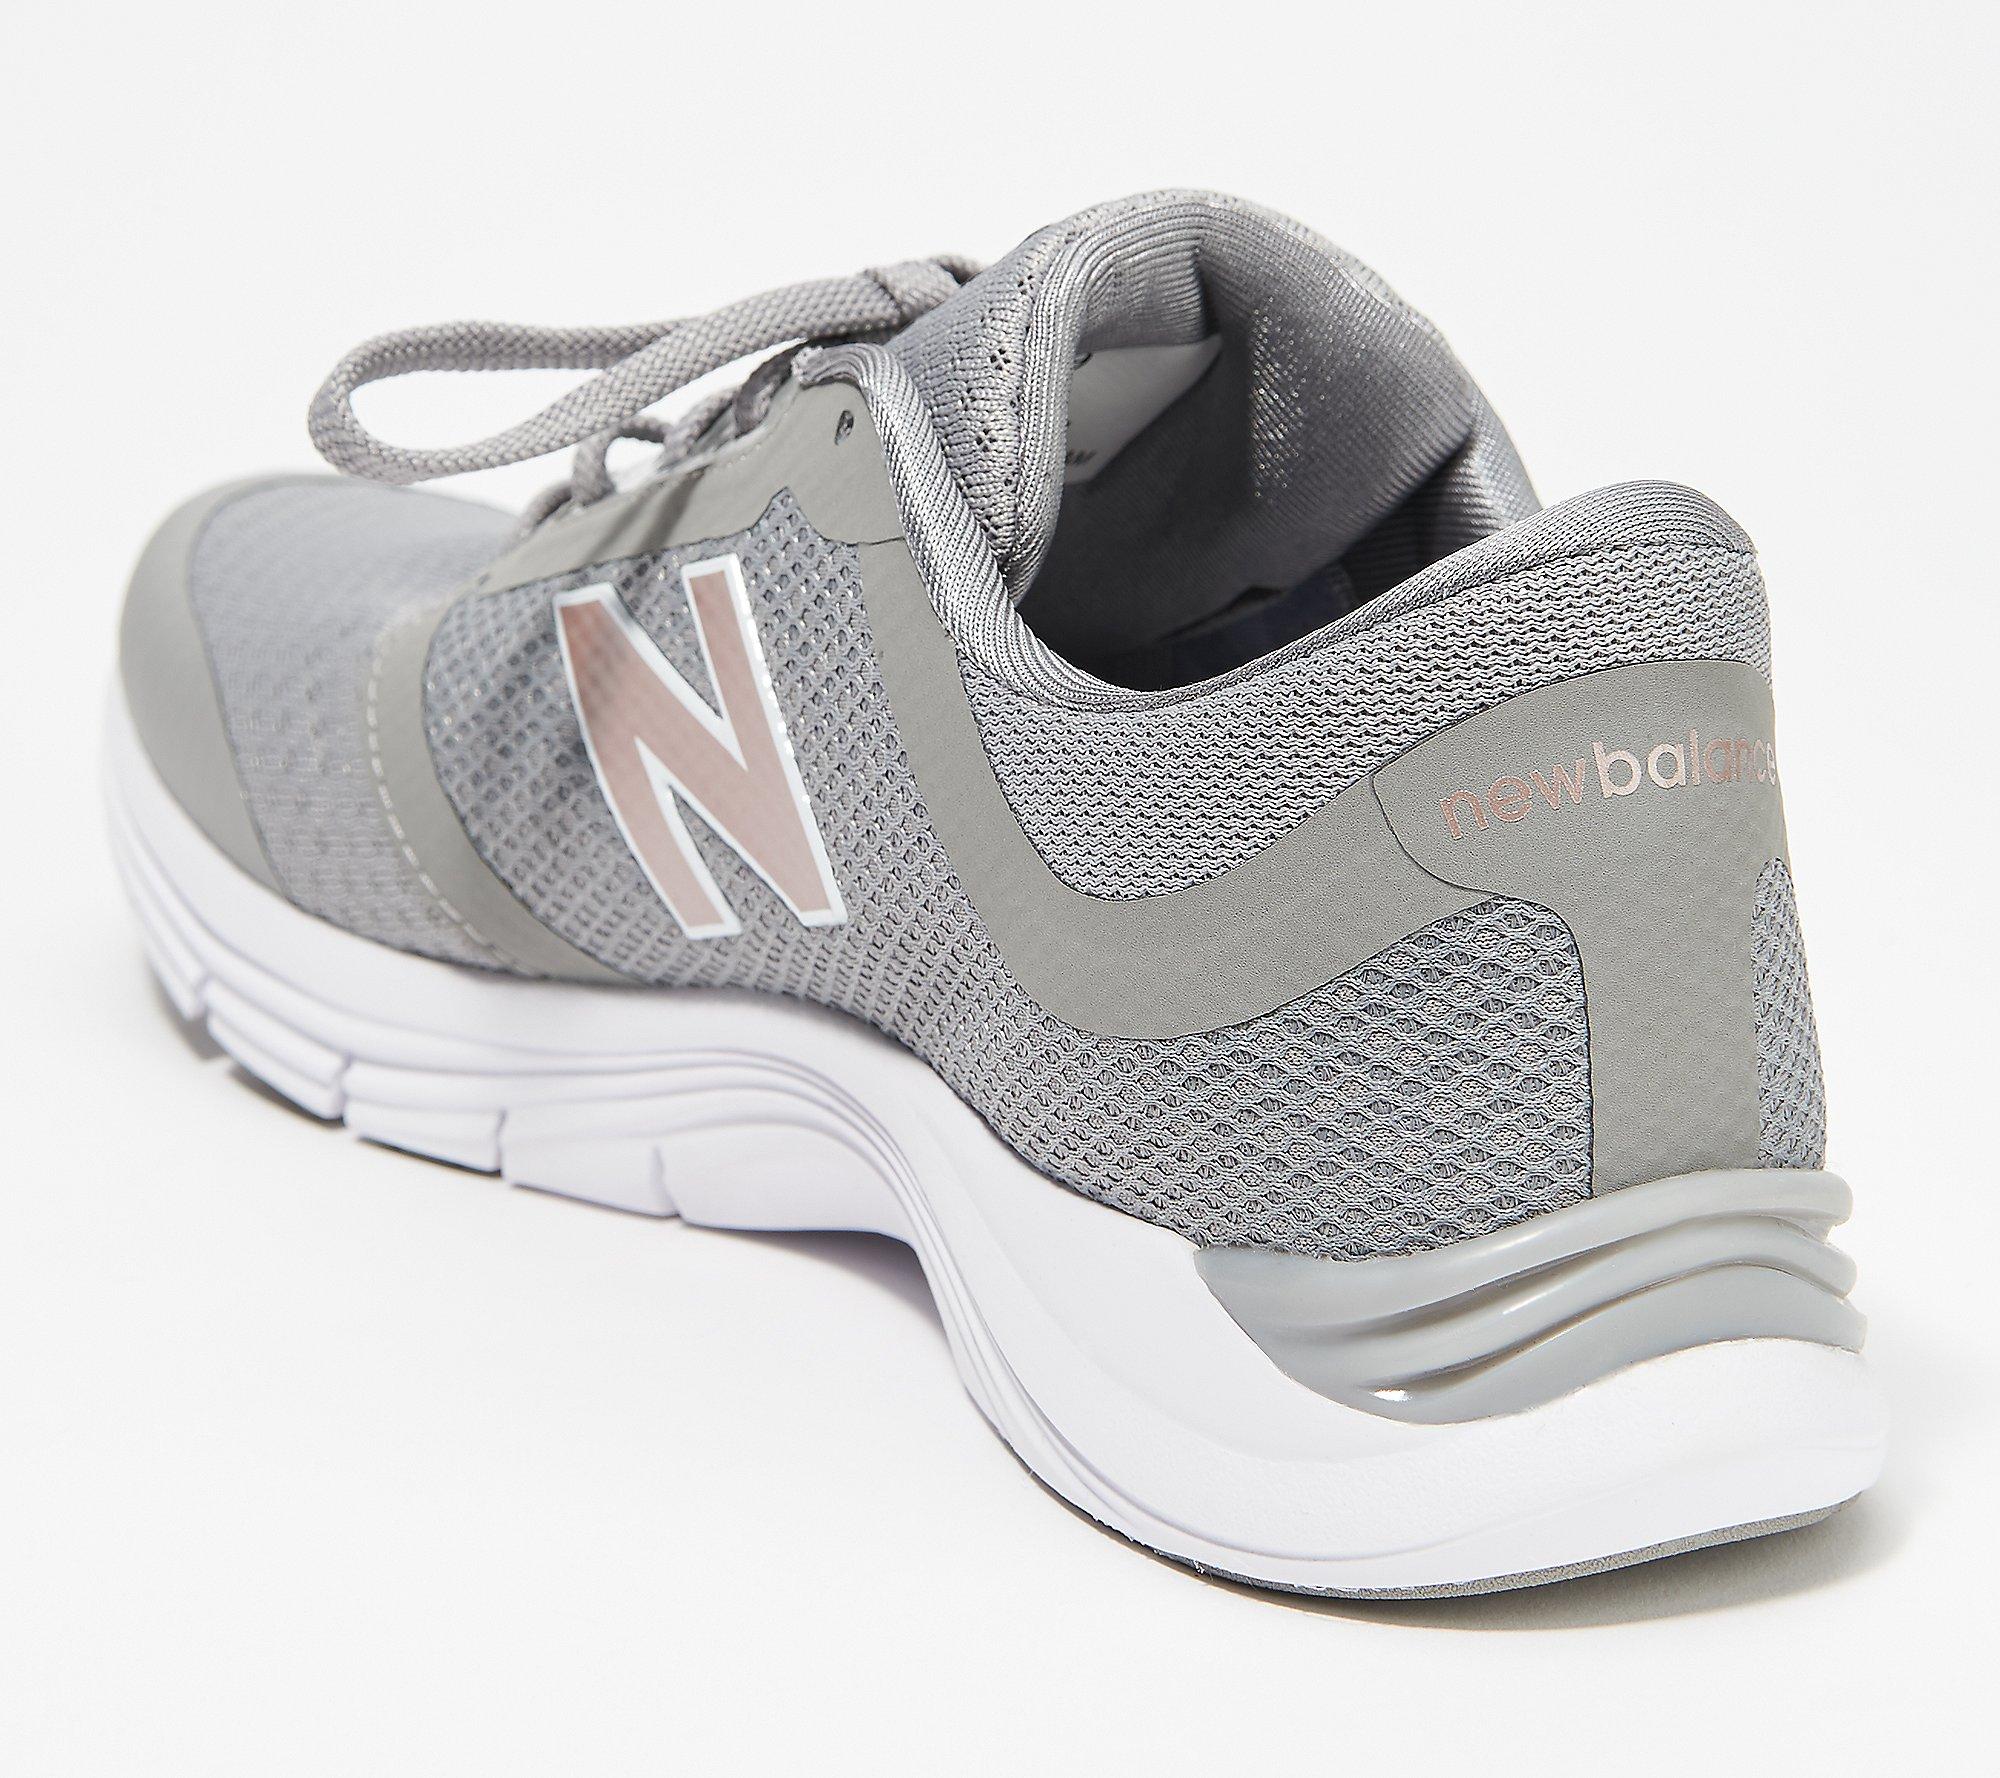 New Balance x Isaac Mizrahi Live! Mesh Lace Up Sneakers - 700 - QVC.com